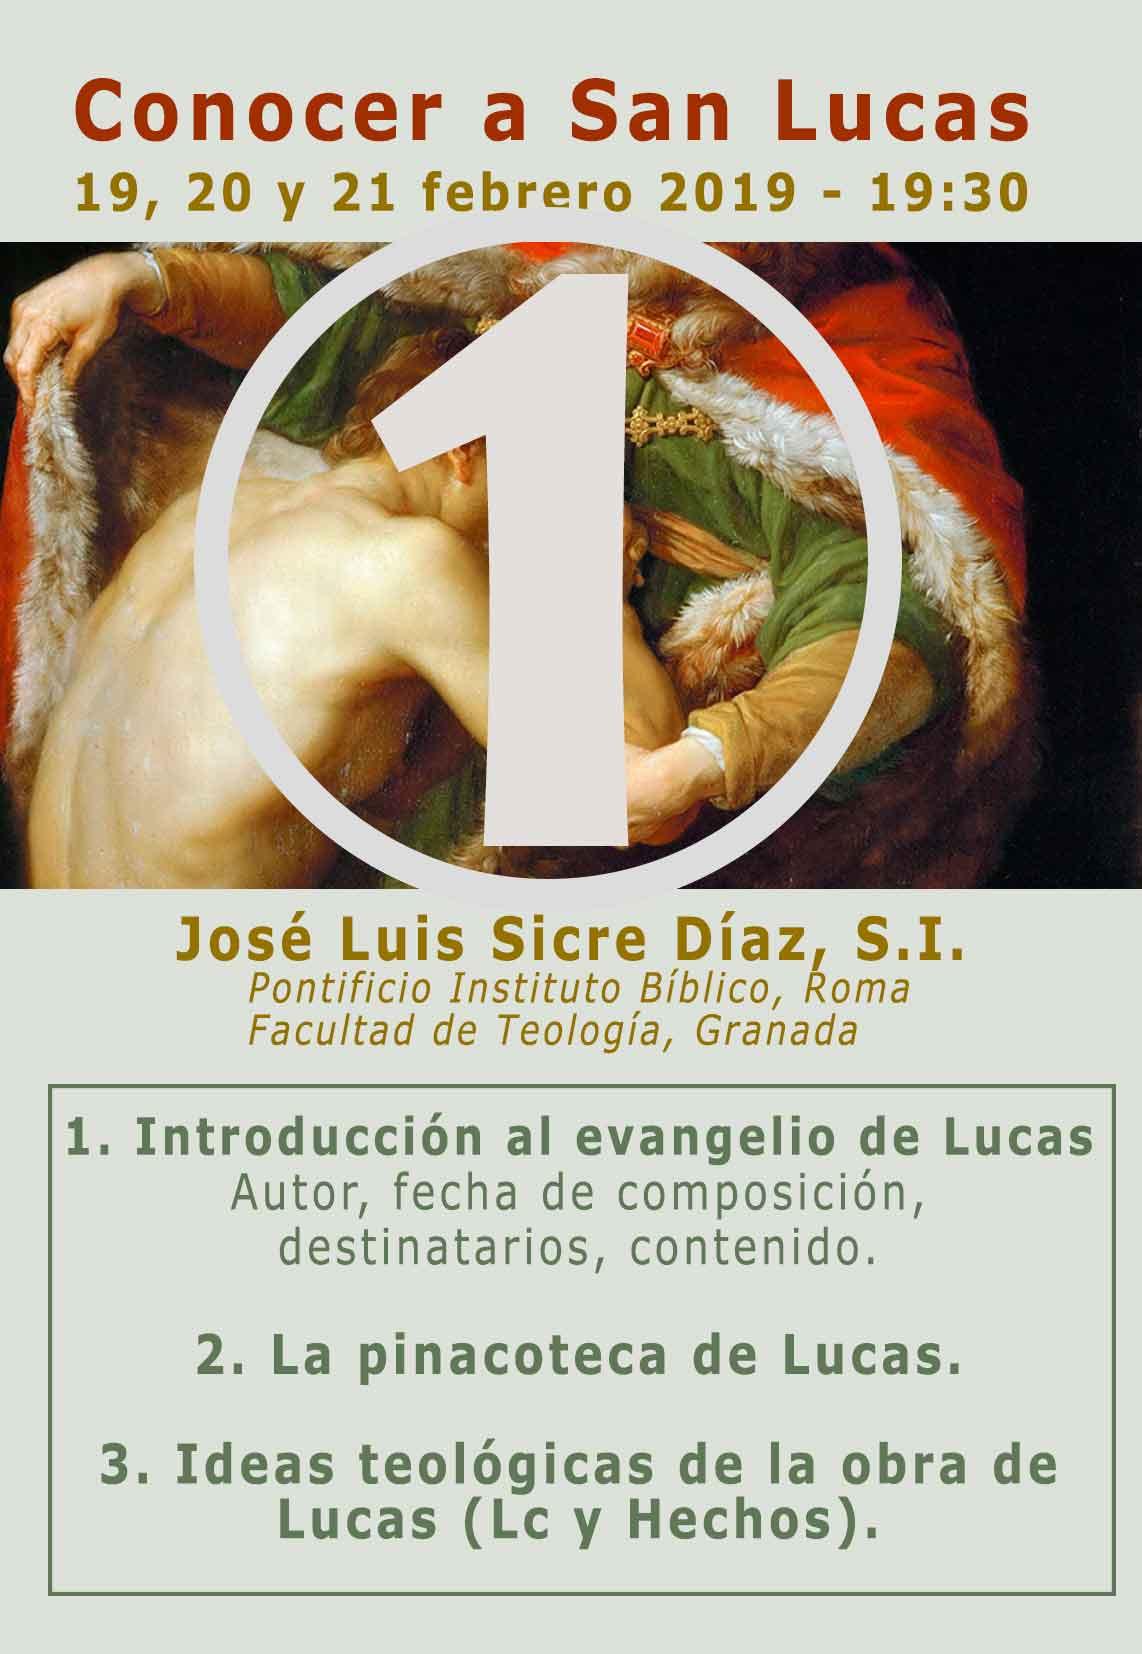 JOSE LUIS SICRE, S.I. PARTE 1